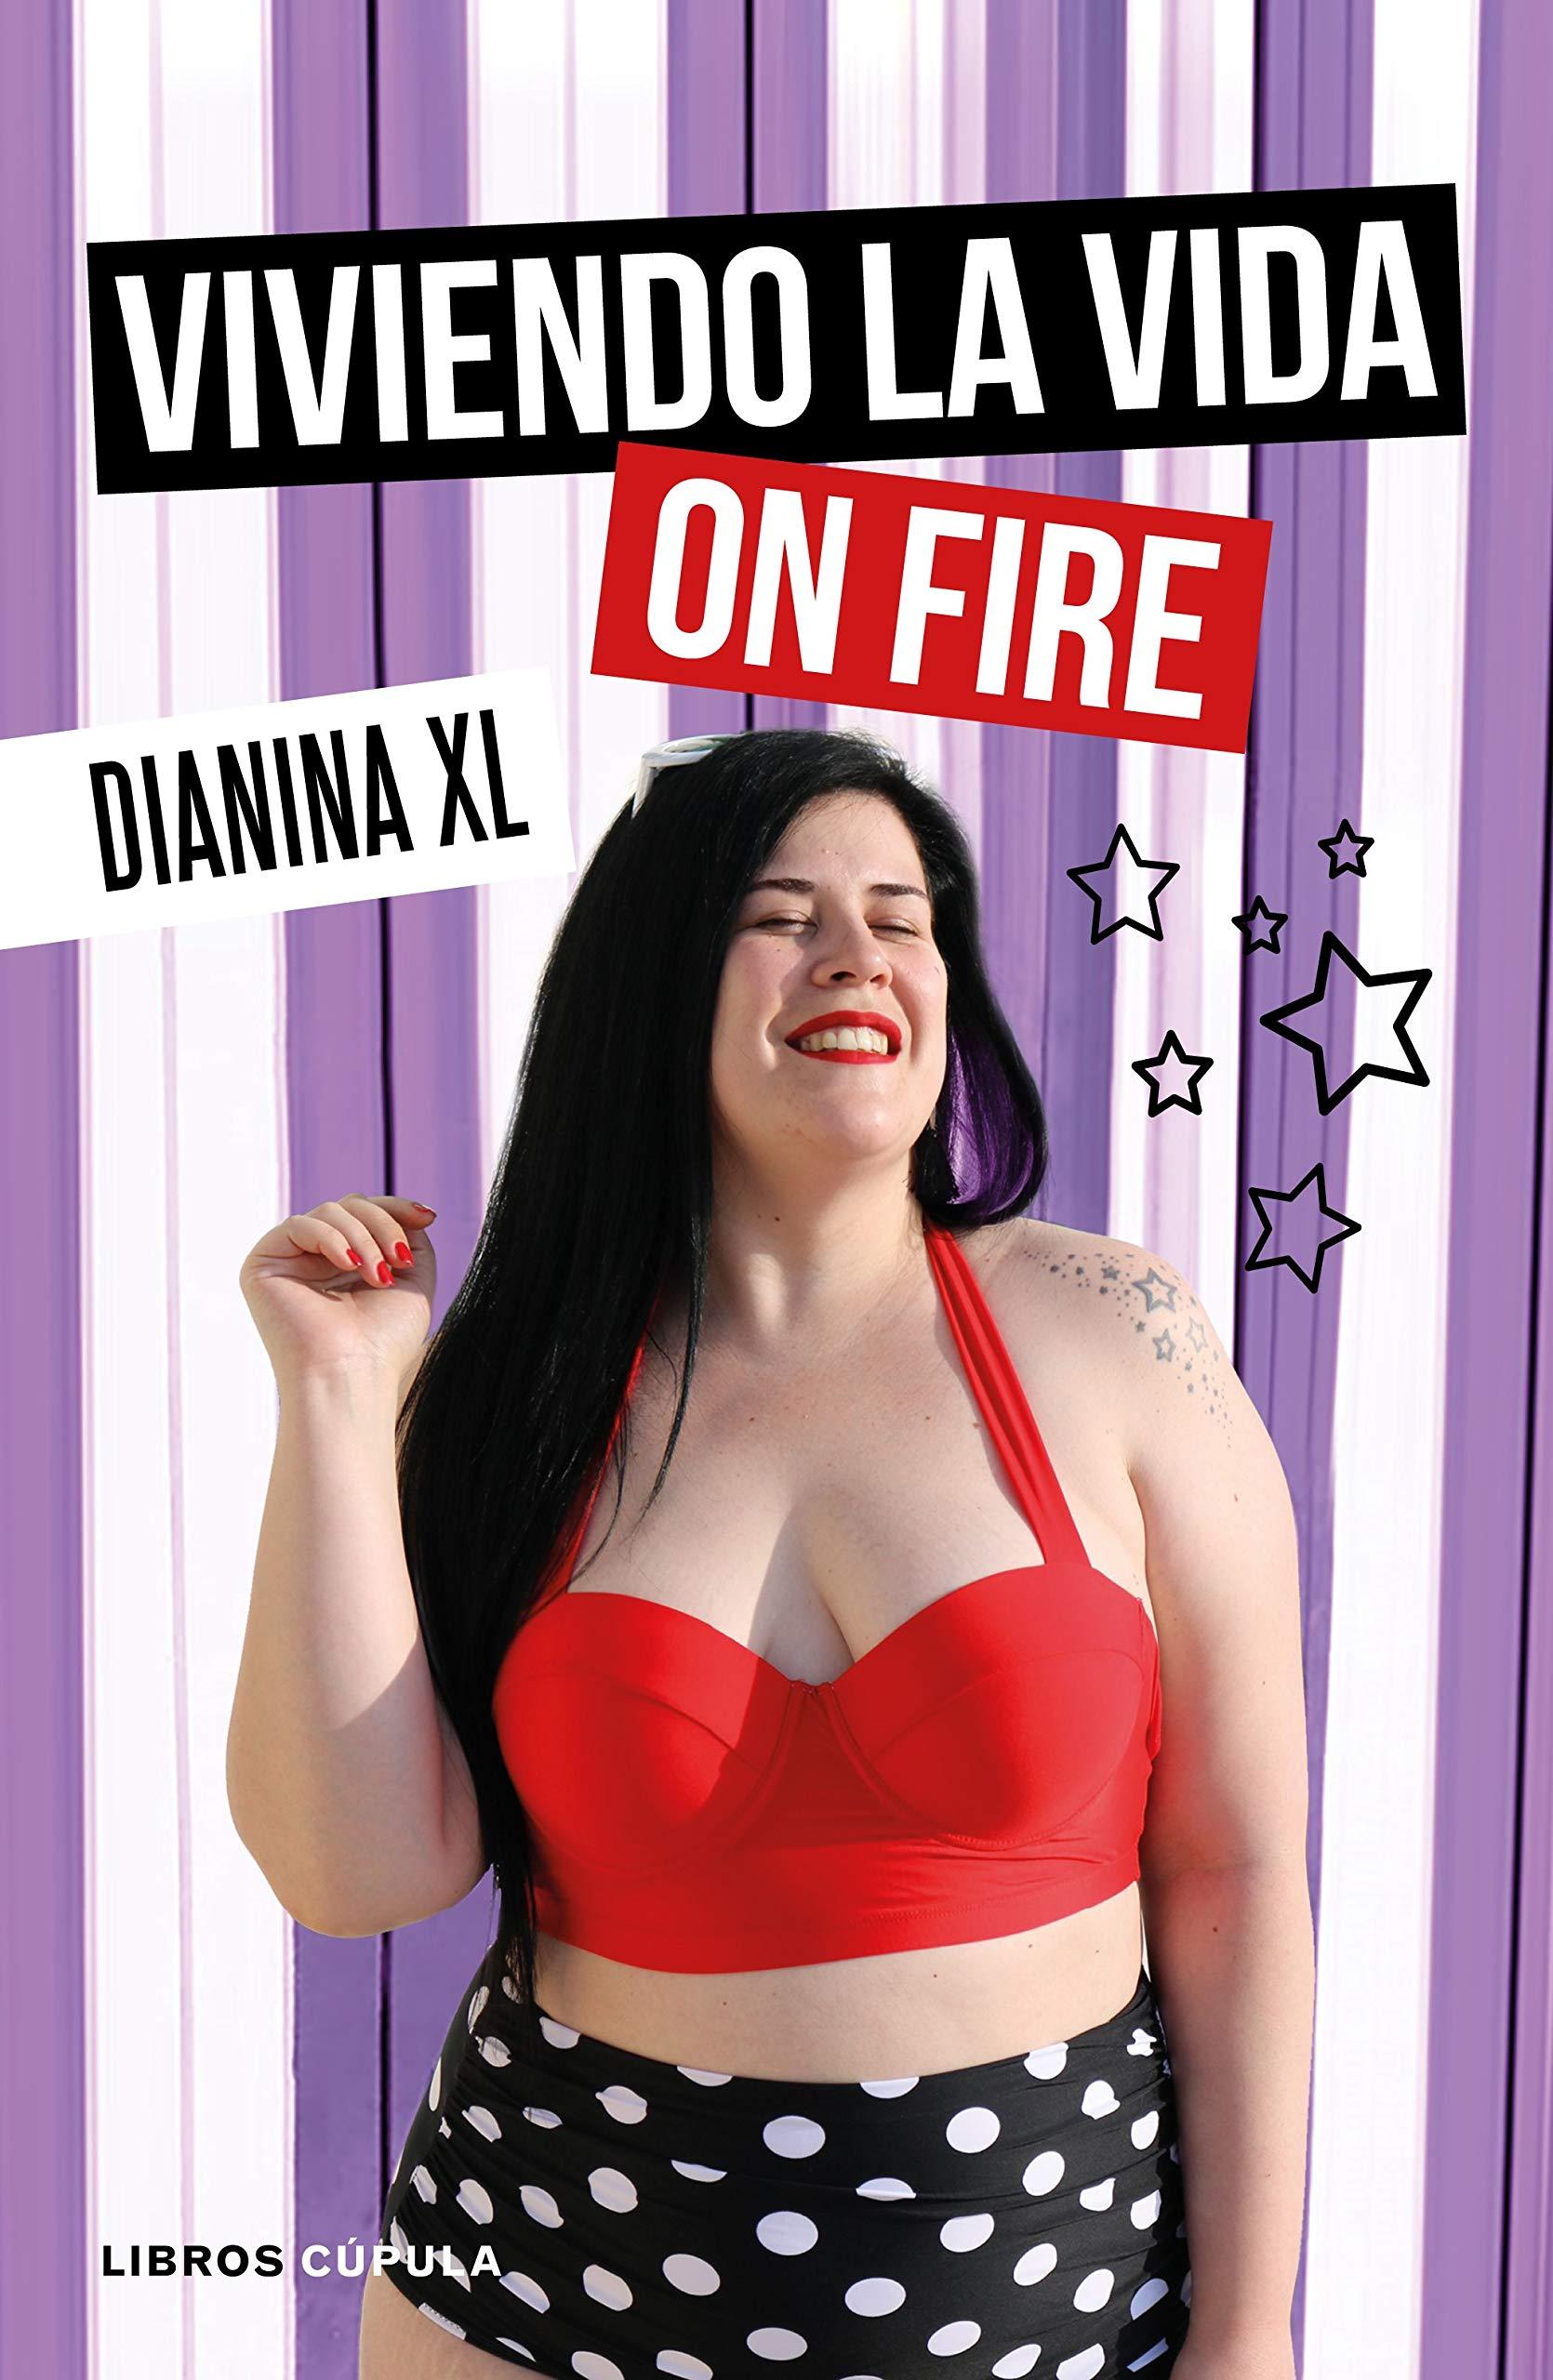 Viviendo la vida on fire: 4 (Hobbies) por Dianina XL